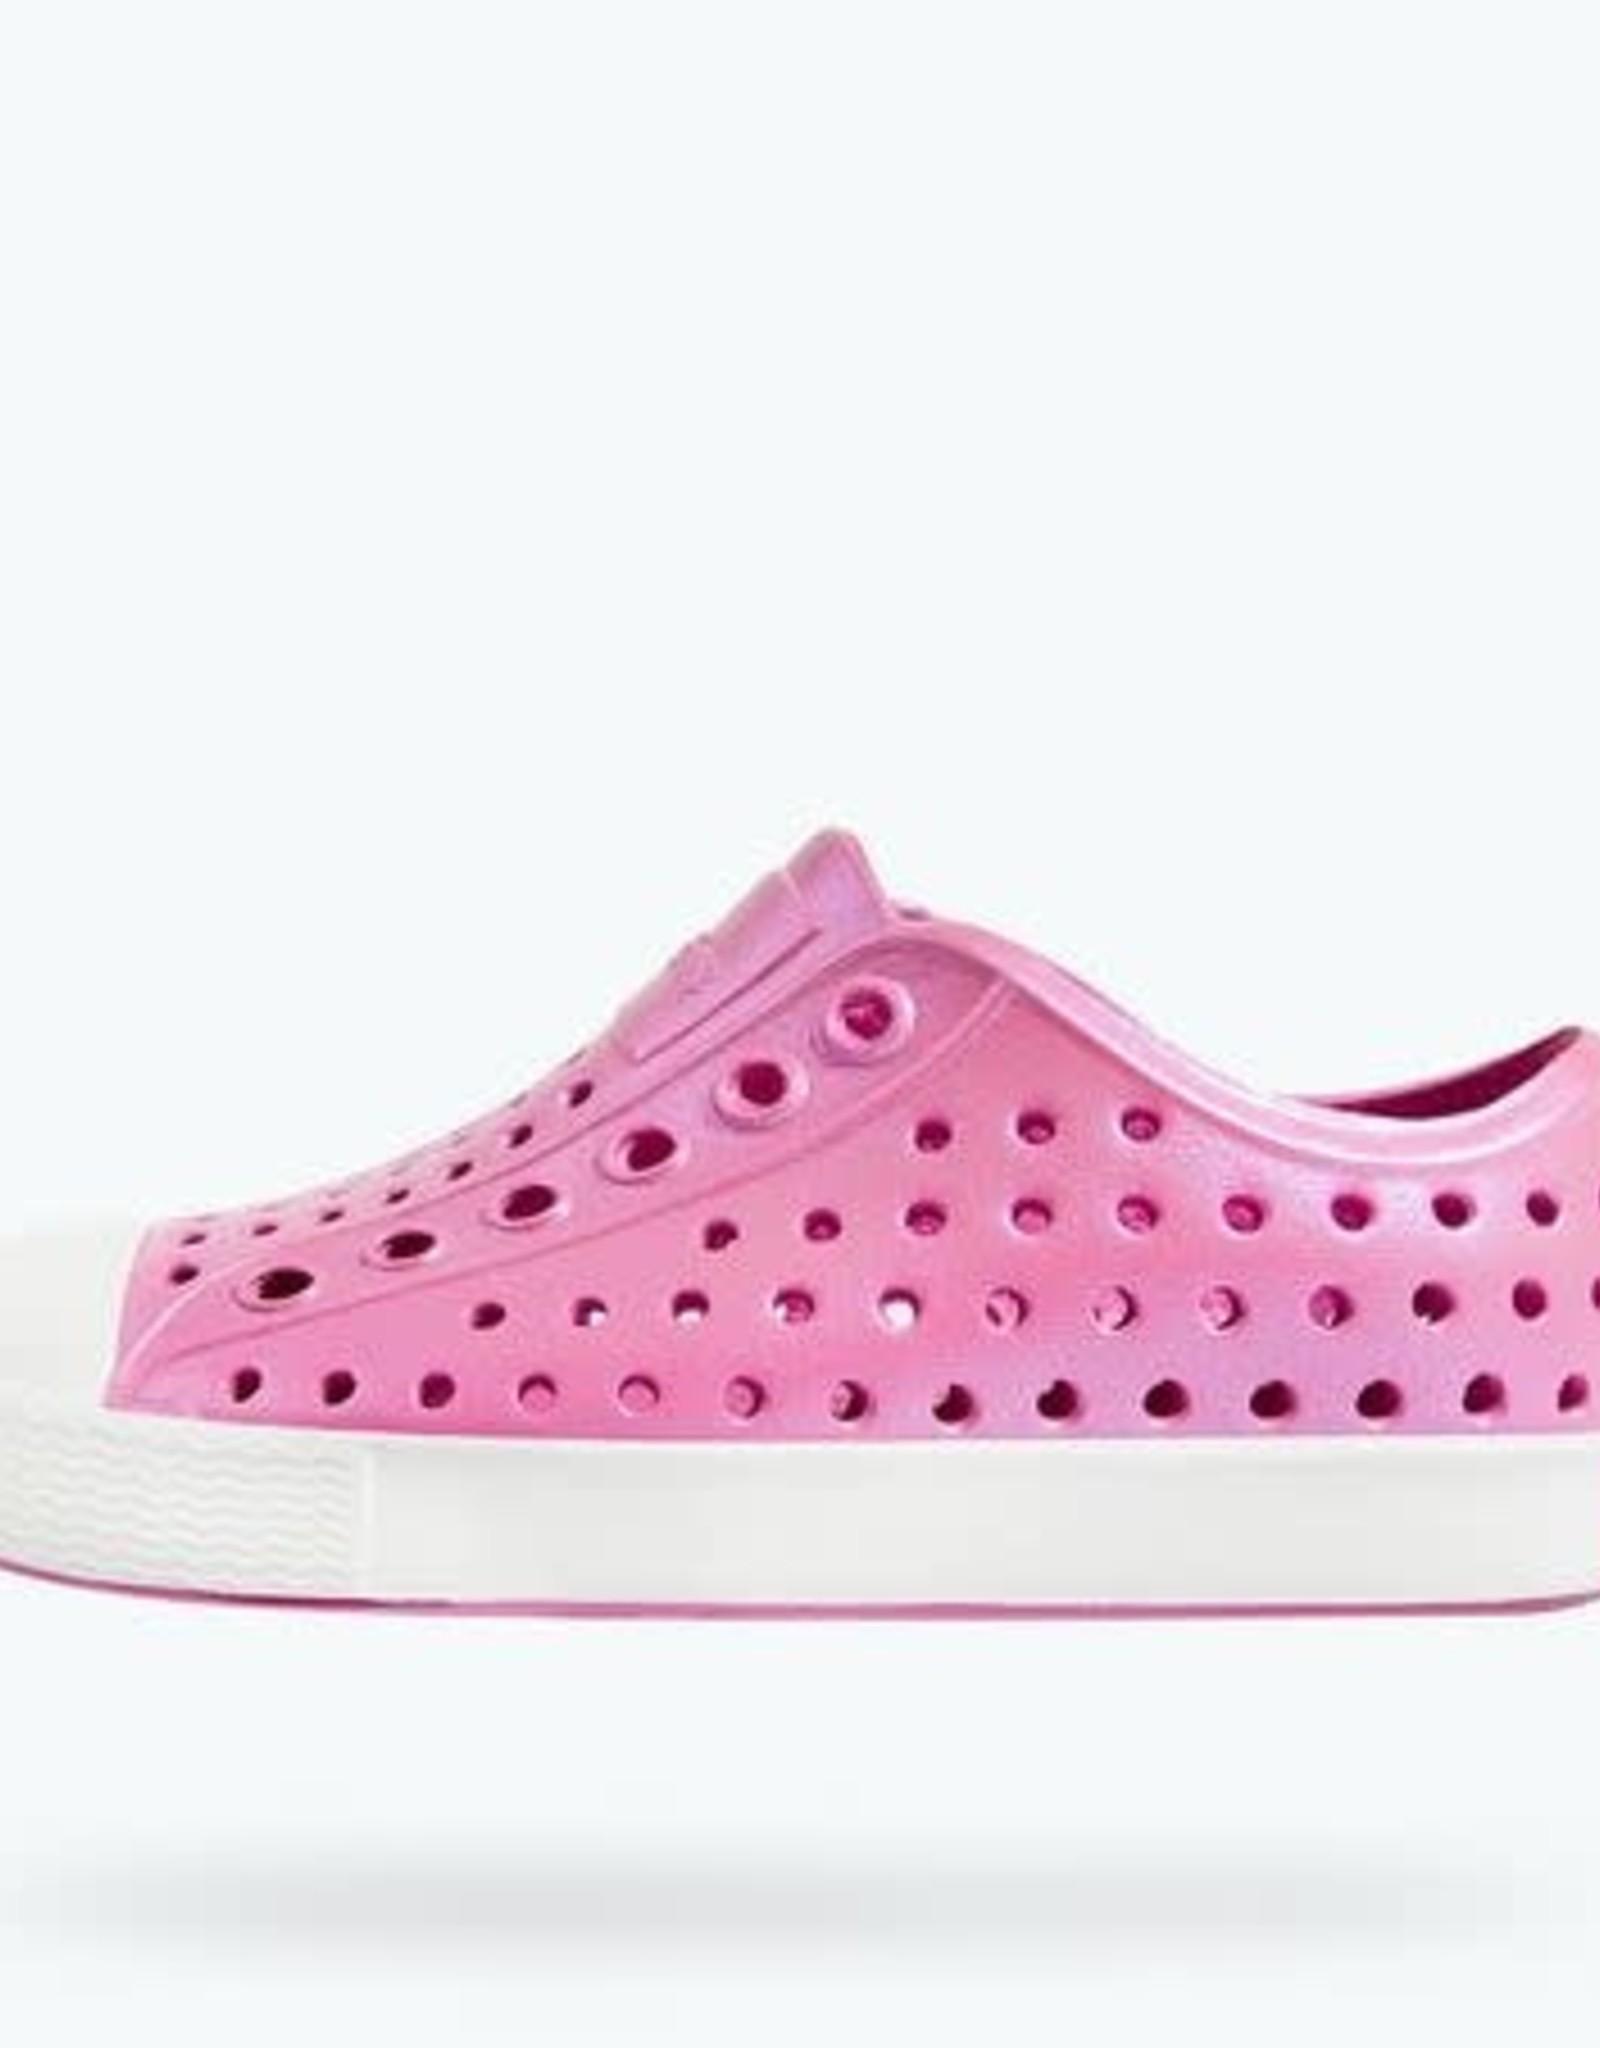 Native Shoes Jefferson in Iridescent Malibu Pink